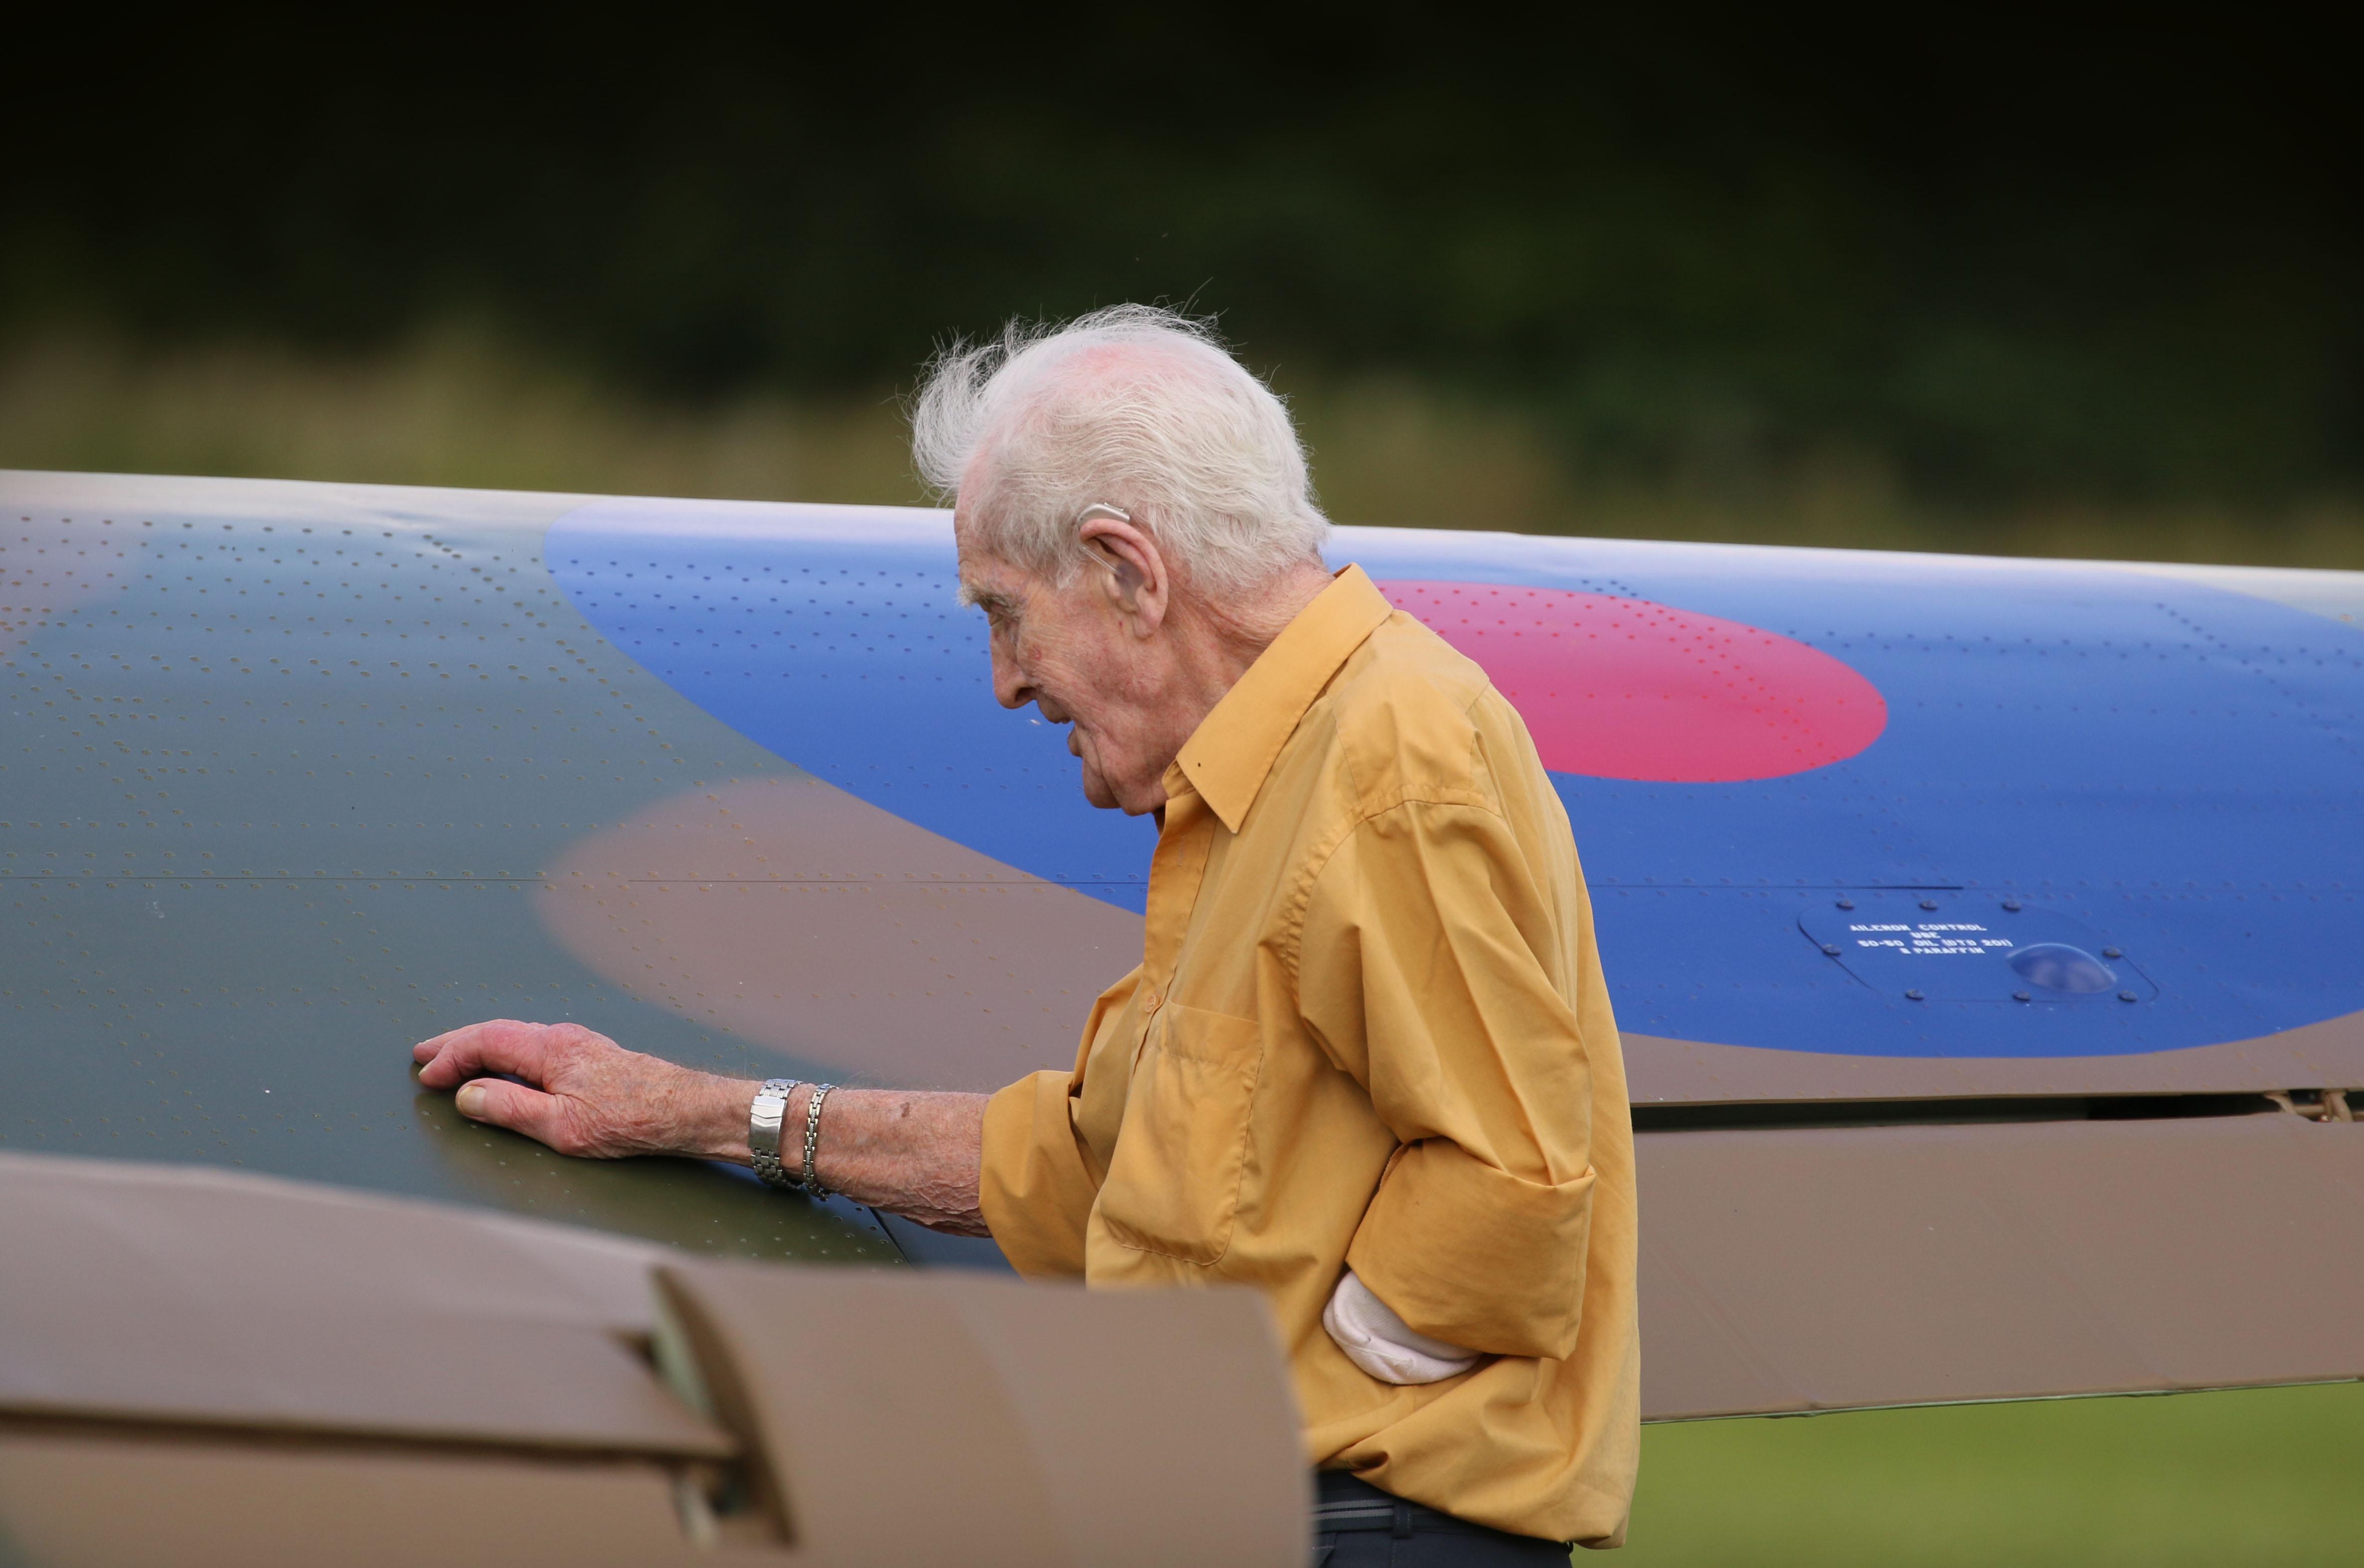 McLachlan Hurricane pilot